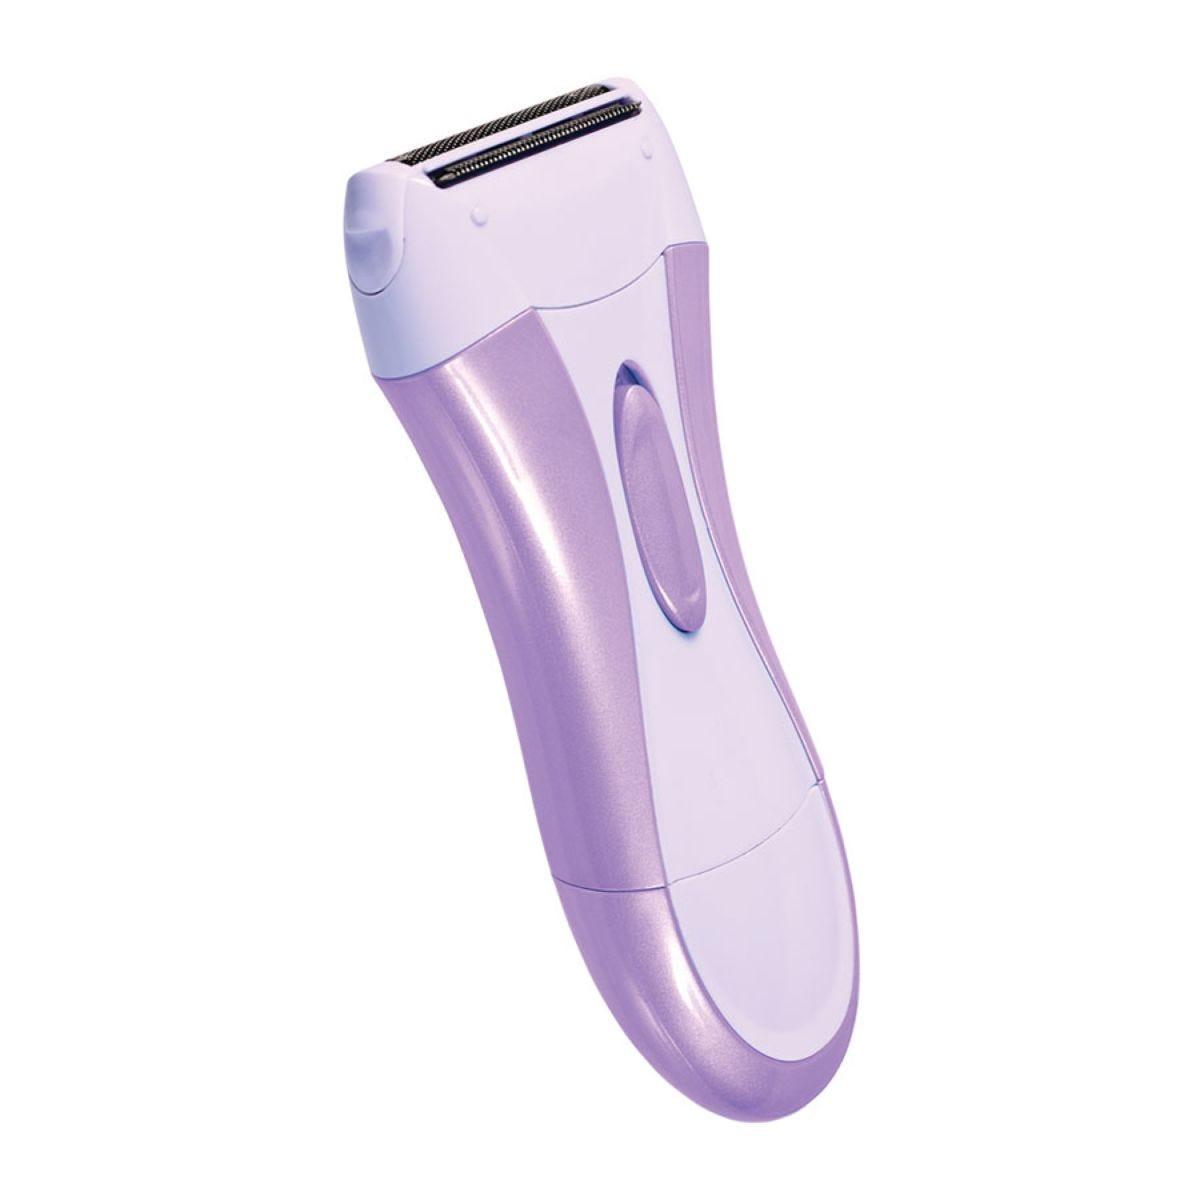 Bauer 38730 Cordless Quick Charge Lady Shaver – Purple